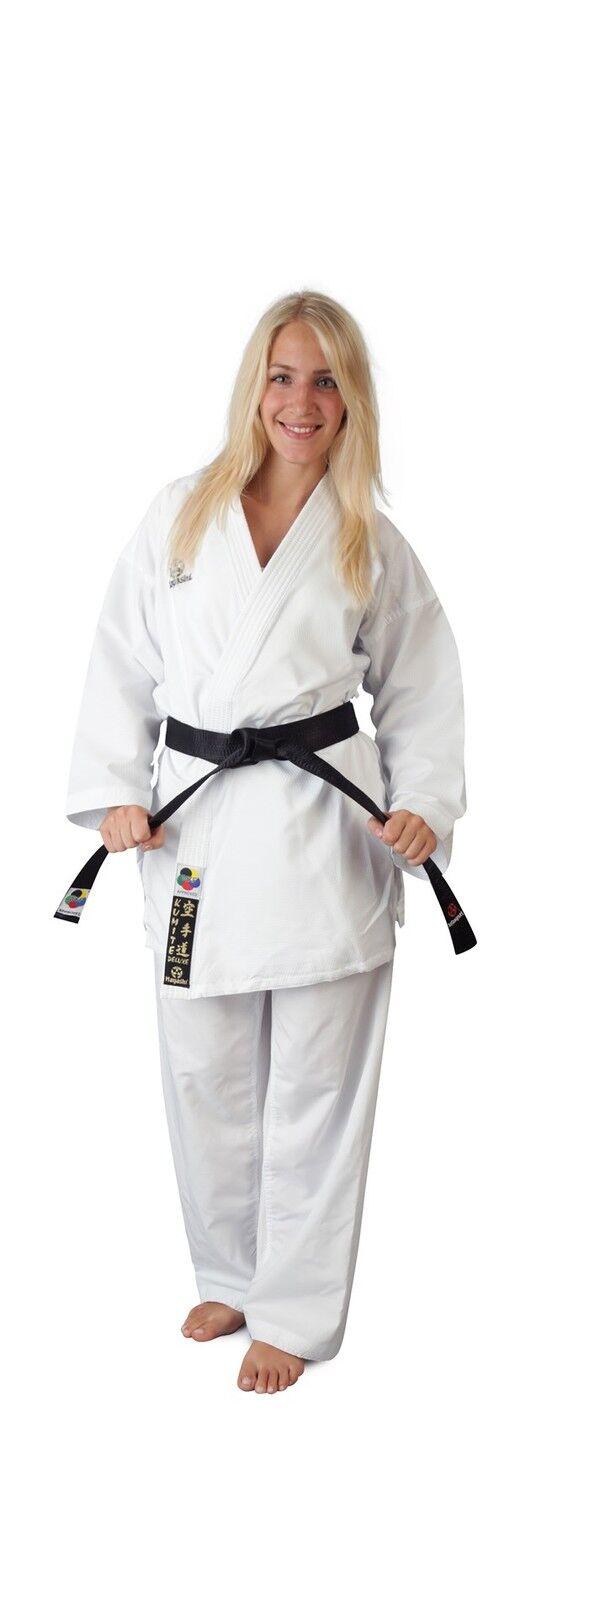 Karategi HAYASHI  Deluxe Kumite  OHNE   Schulterstick. Karateanzug WKF approved